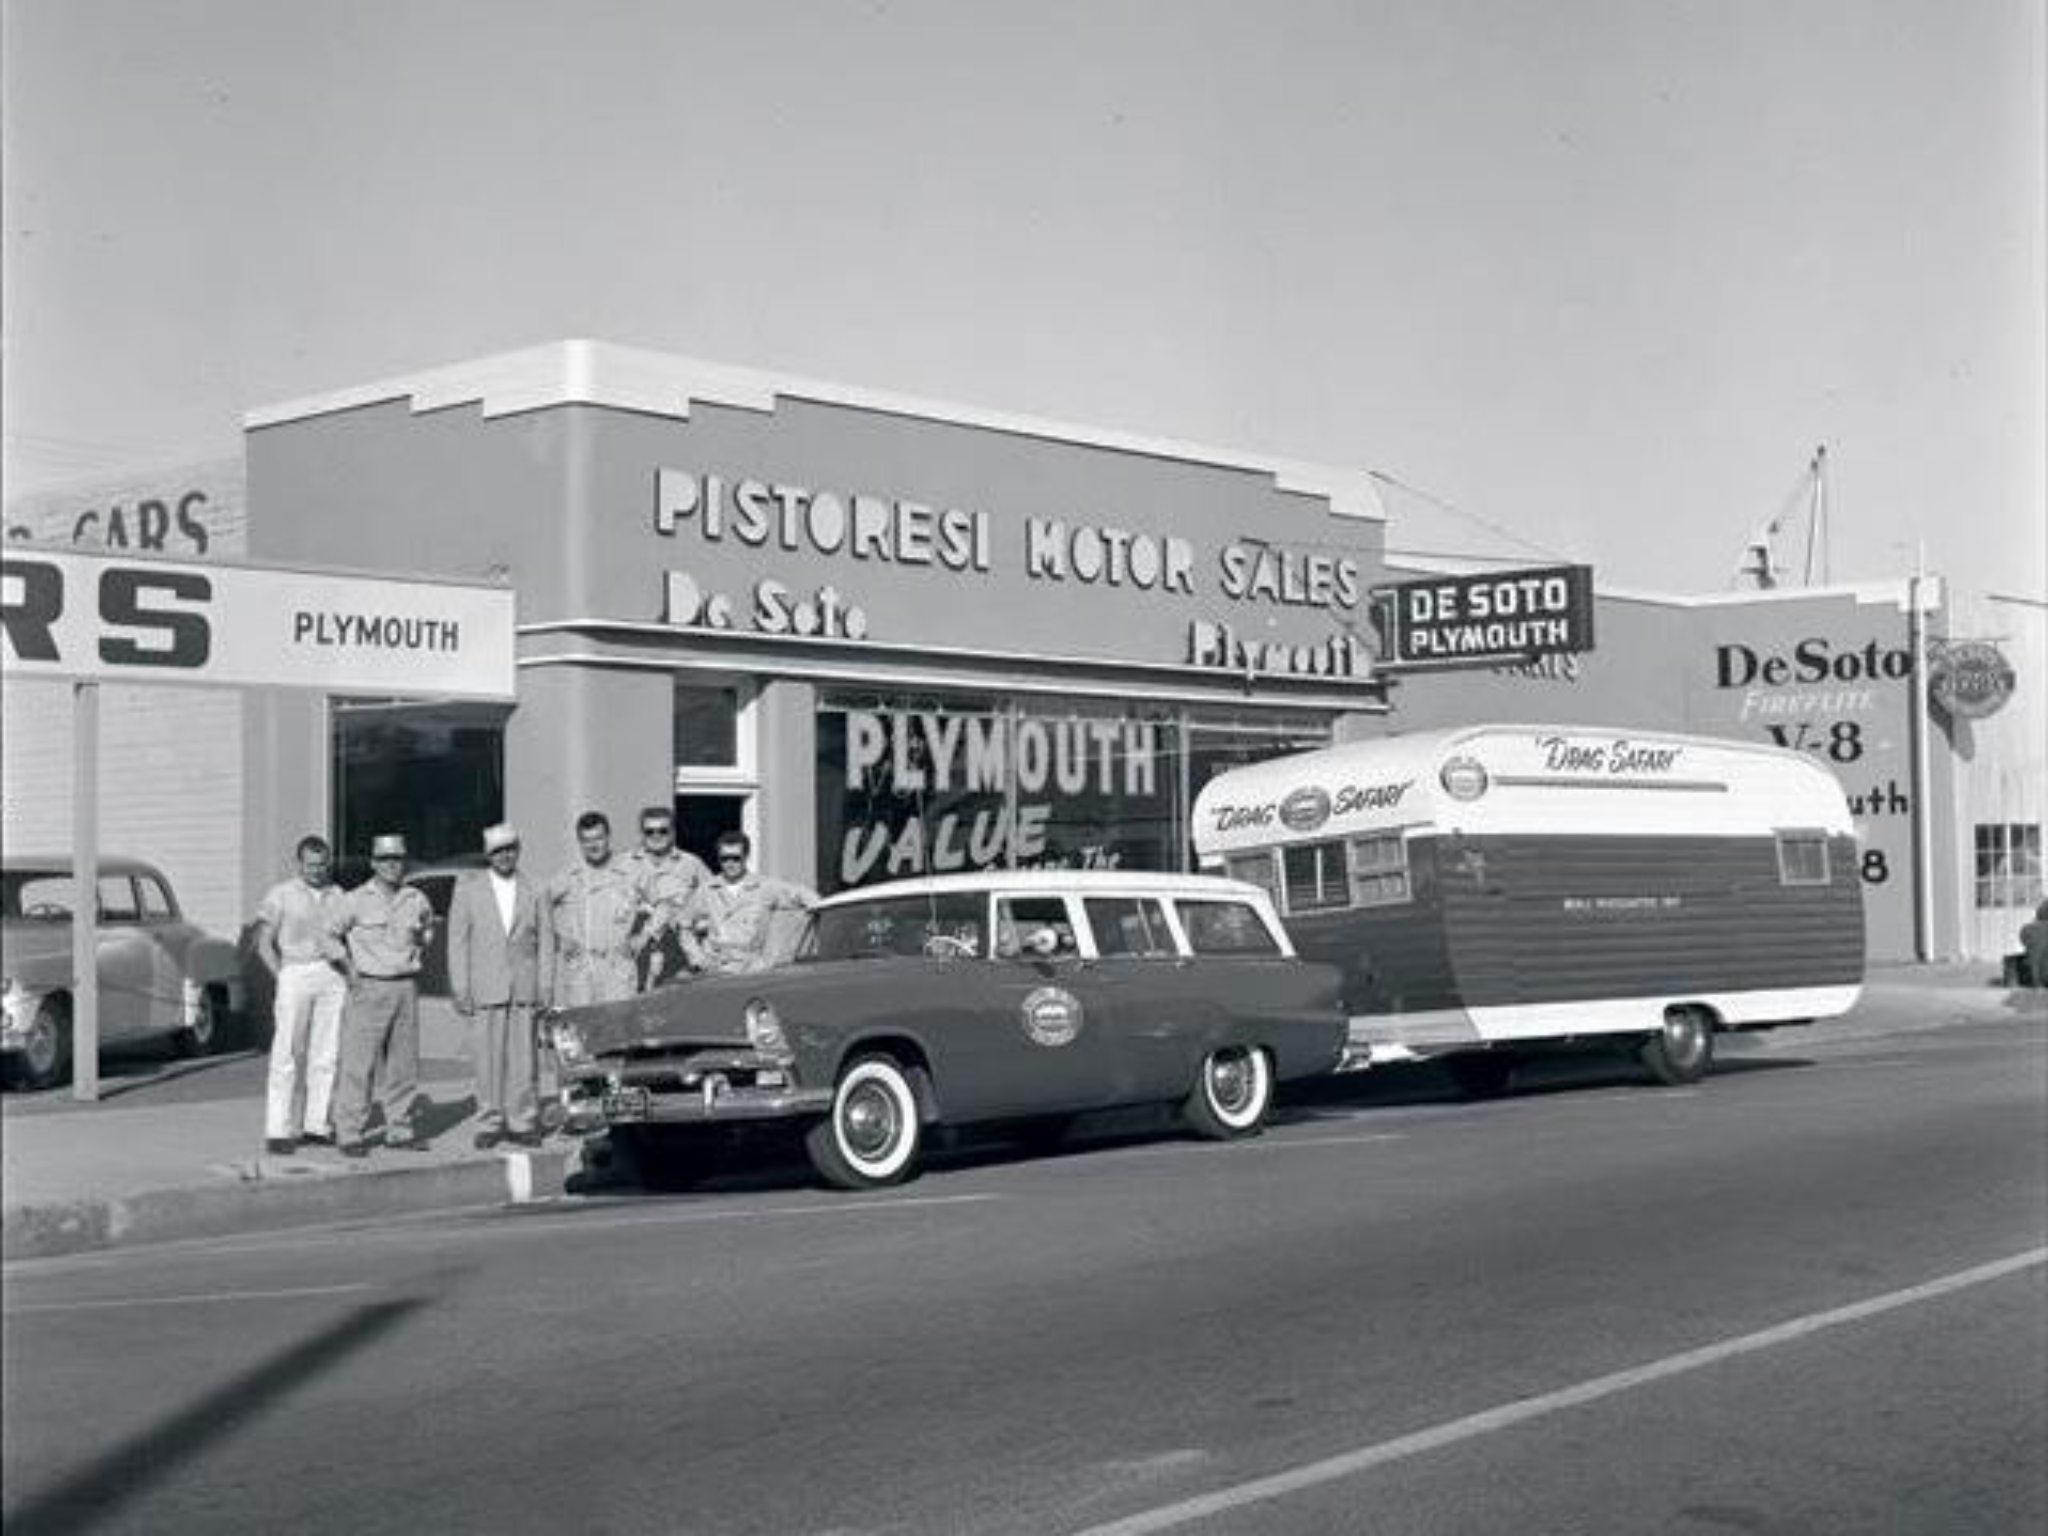 1956 Pistoresi Motor Sales Desoto Plymouth Dealership Madera California Car Dealership Vintage Travel Trailers Vintage Trailers